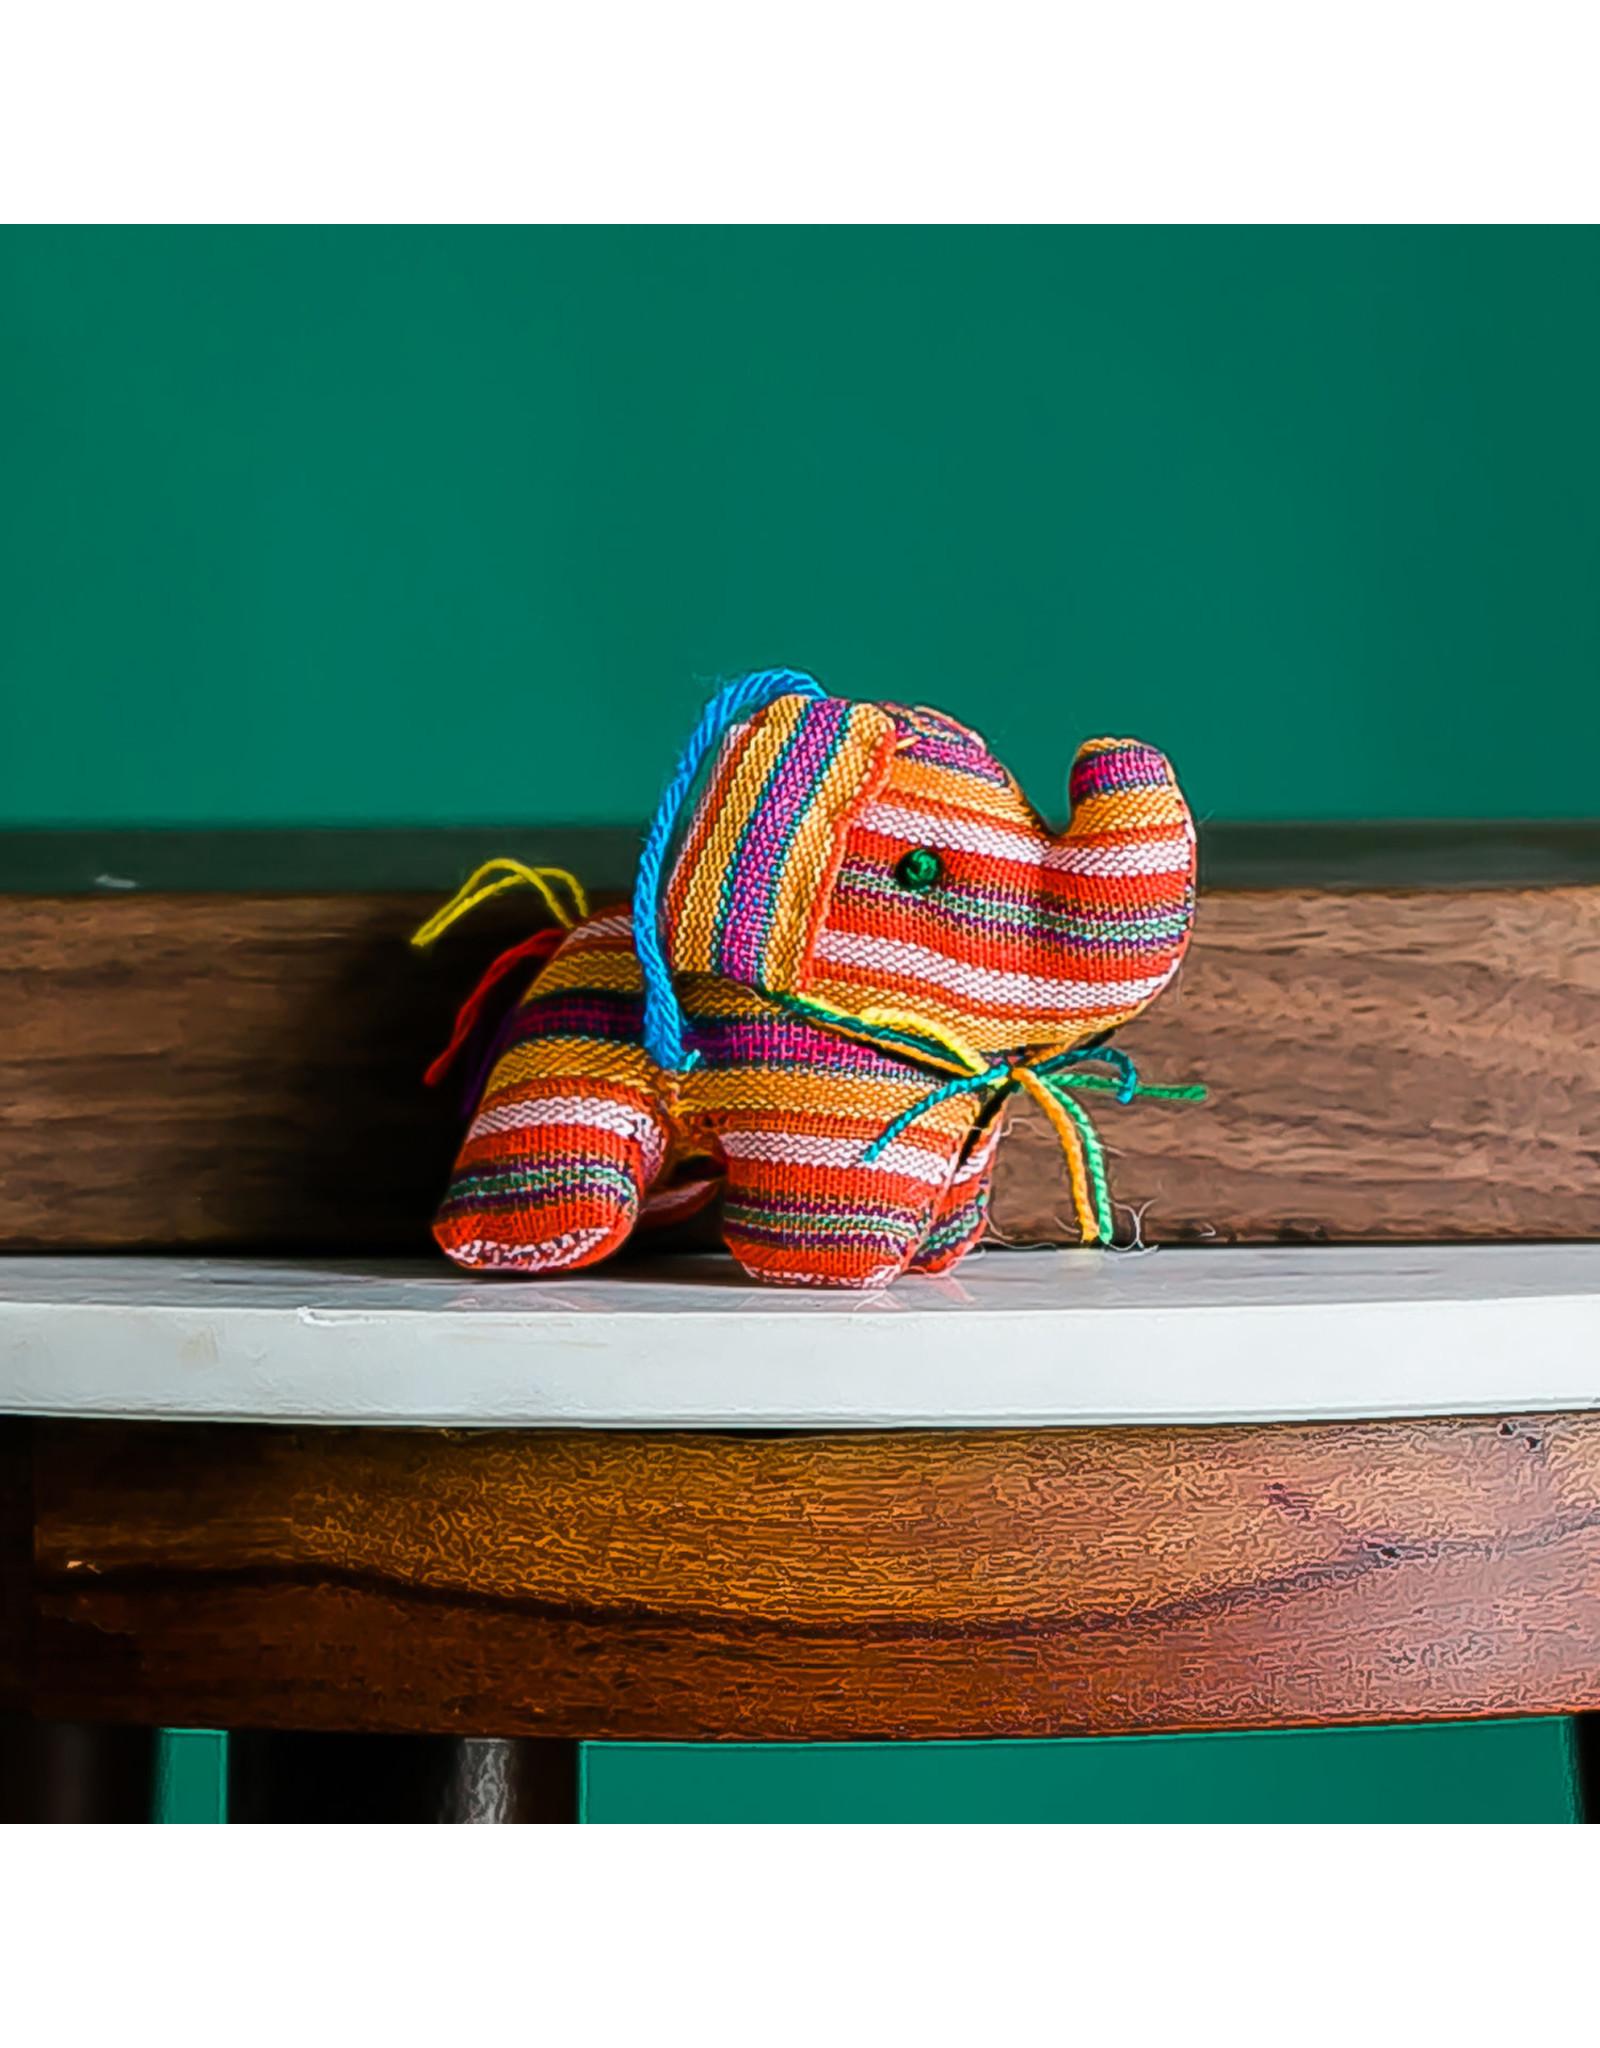 Lucia's Imports Stuffed Elephant Ornament, Guatemala